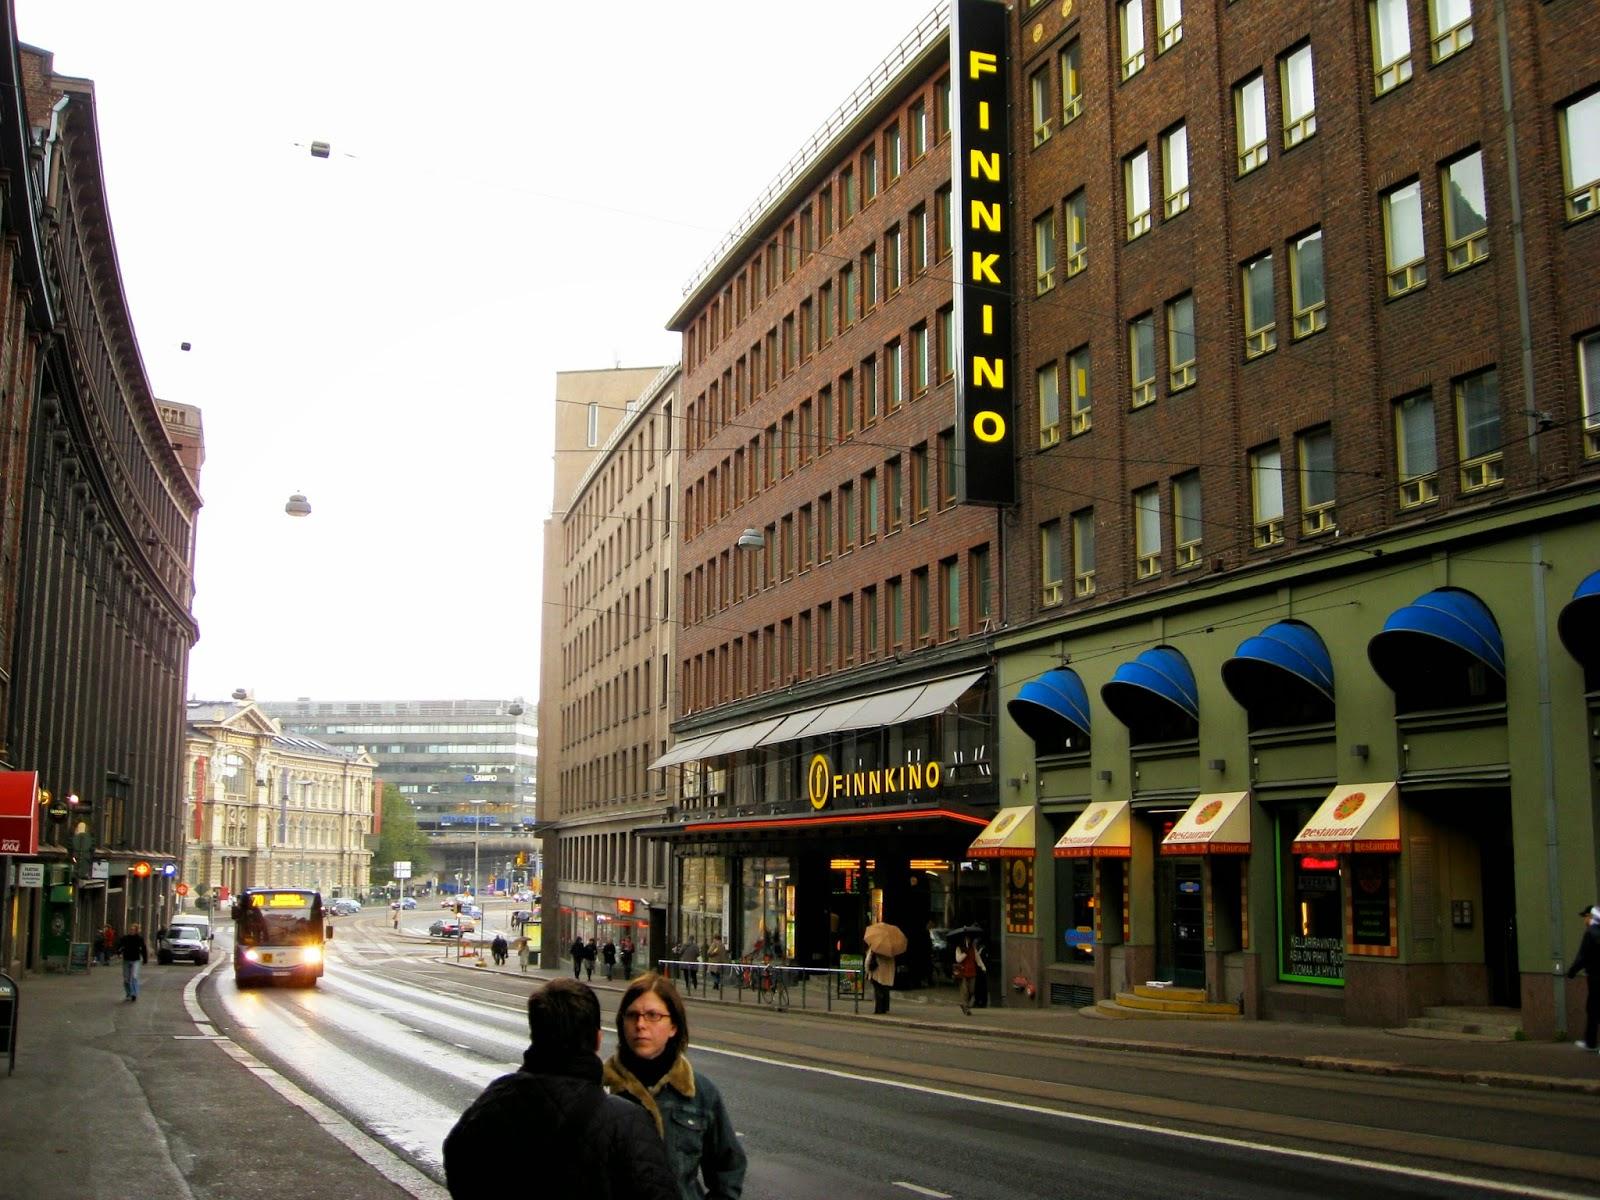 Pringles Pillu Finnkino Turku Osoite